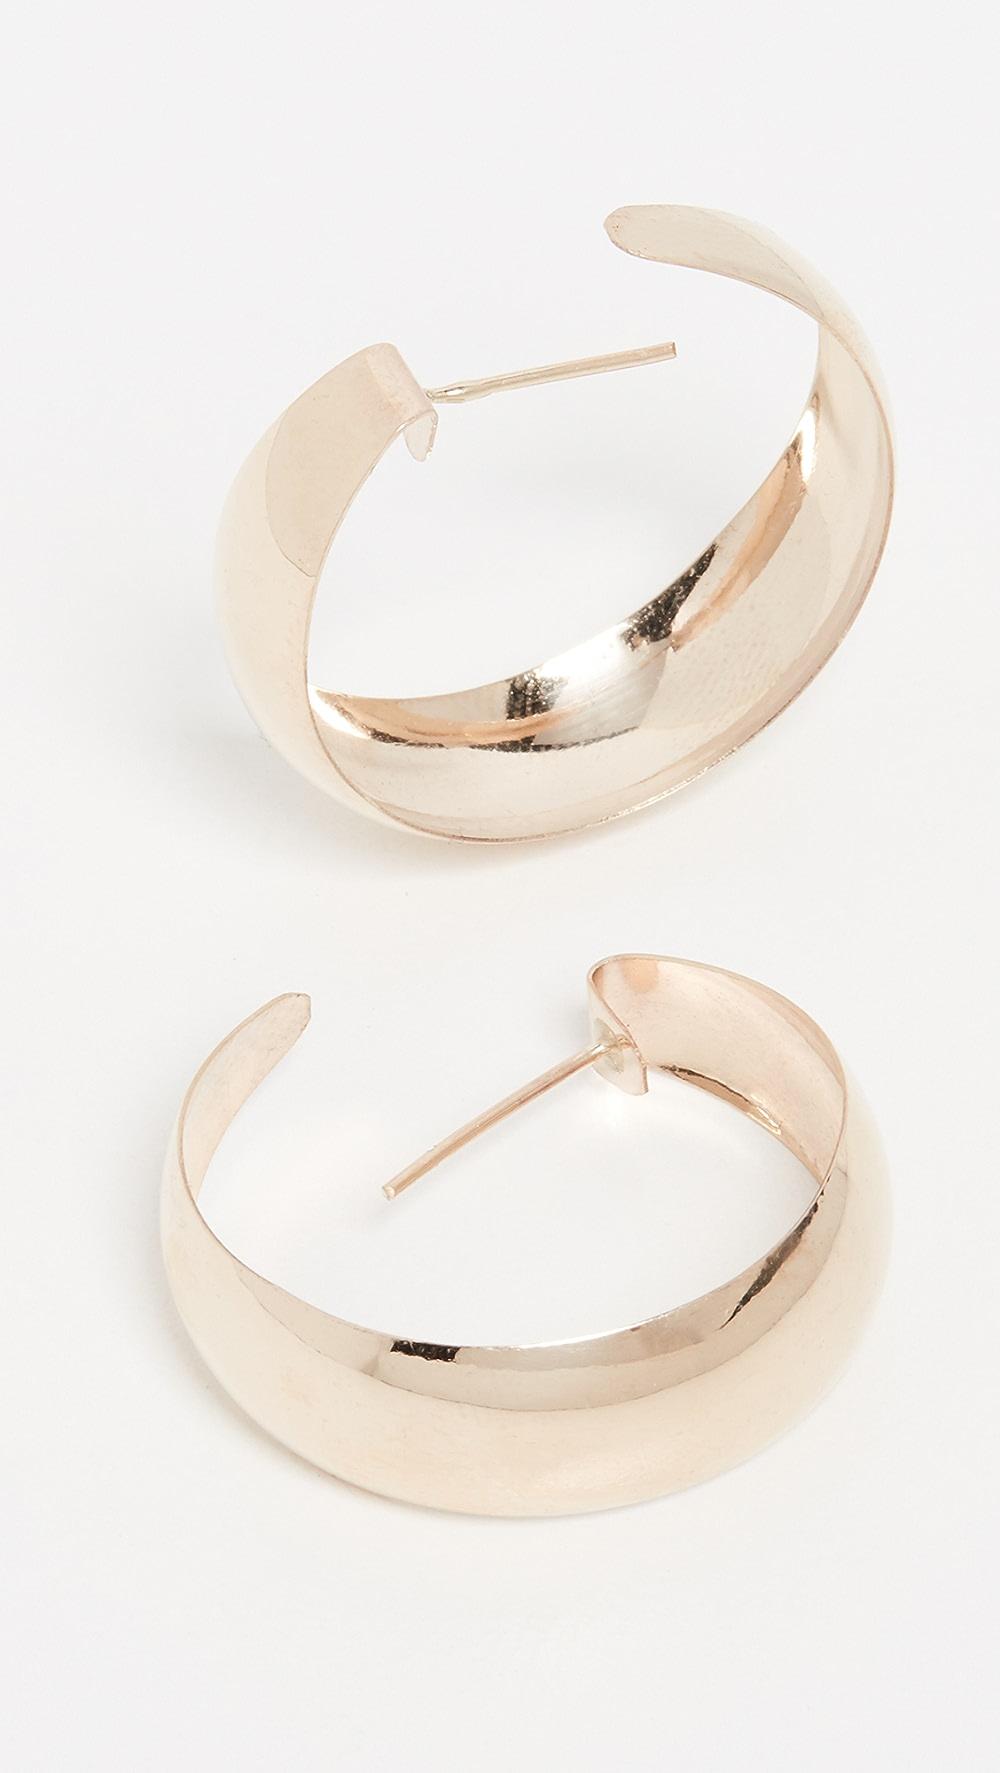 100% Quality Loren Stewart - Dome Hoop Earrings Refreshment